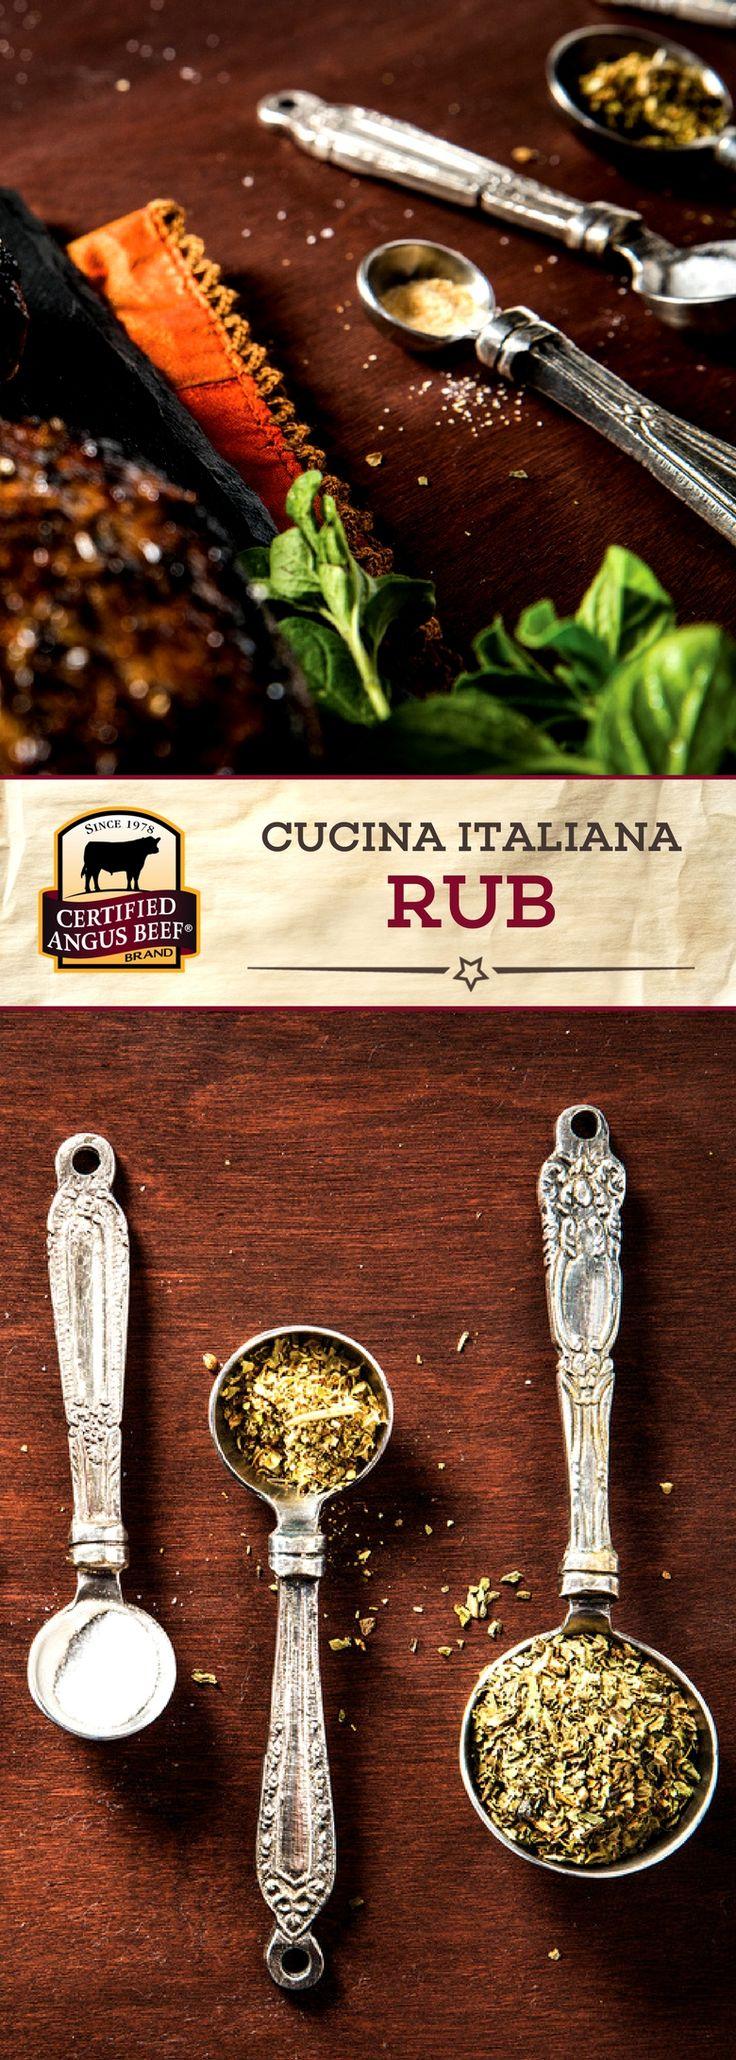 Certified Angus Beef®️️ brand Cucina Italiana Rub combines basil, oregano, and garlic powder for a deep flavor! This EASY seasoning mix brightens any beef recipe.  #bestangusbeef #certifiedangusbeef #steakrub #seasoning